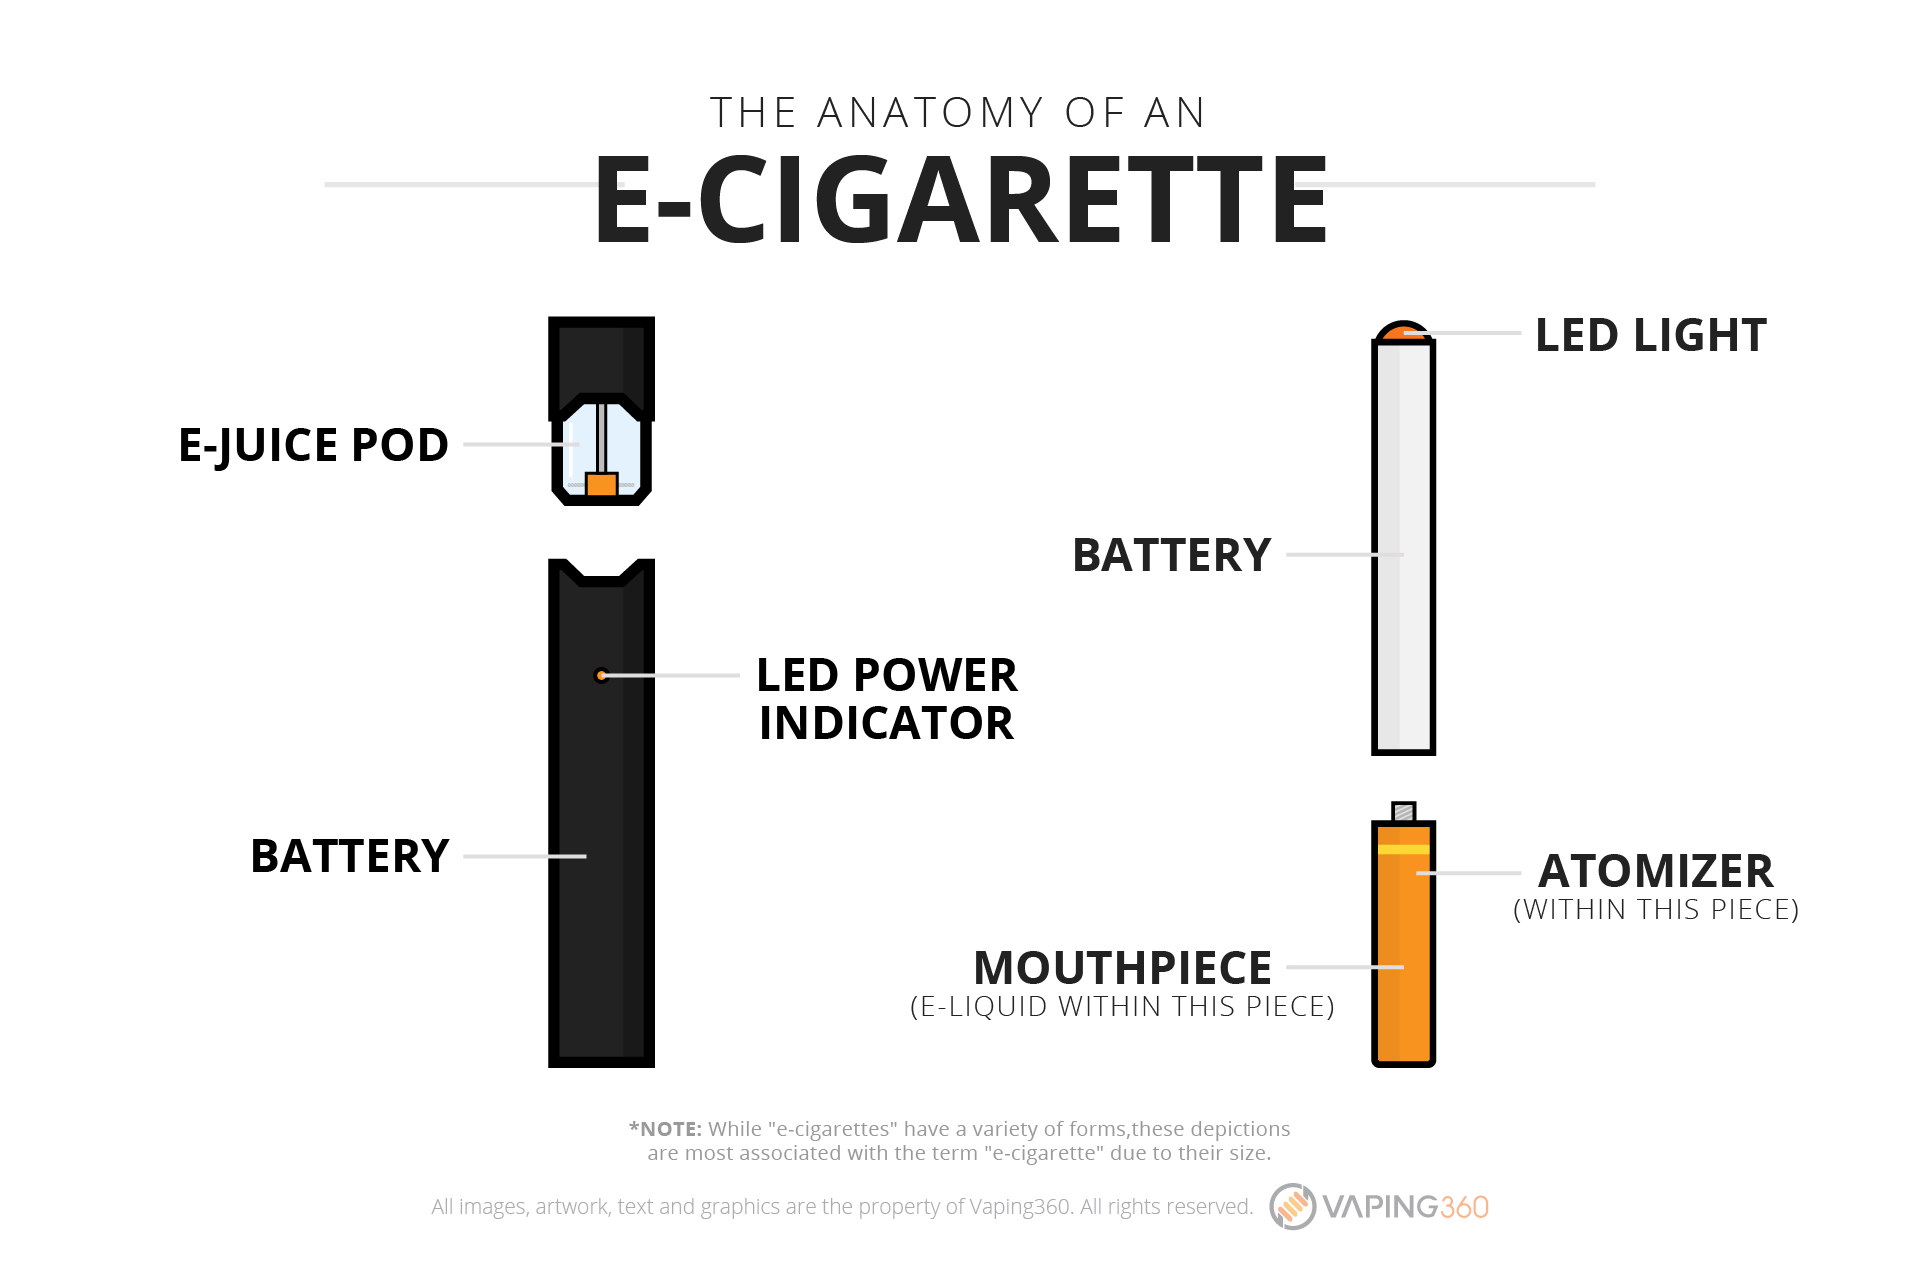 the-anatomy-of-an-e-cigarette